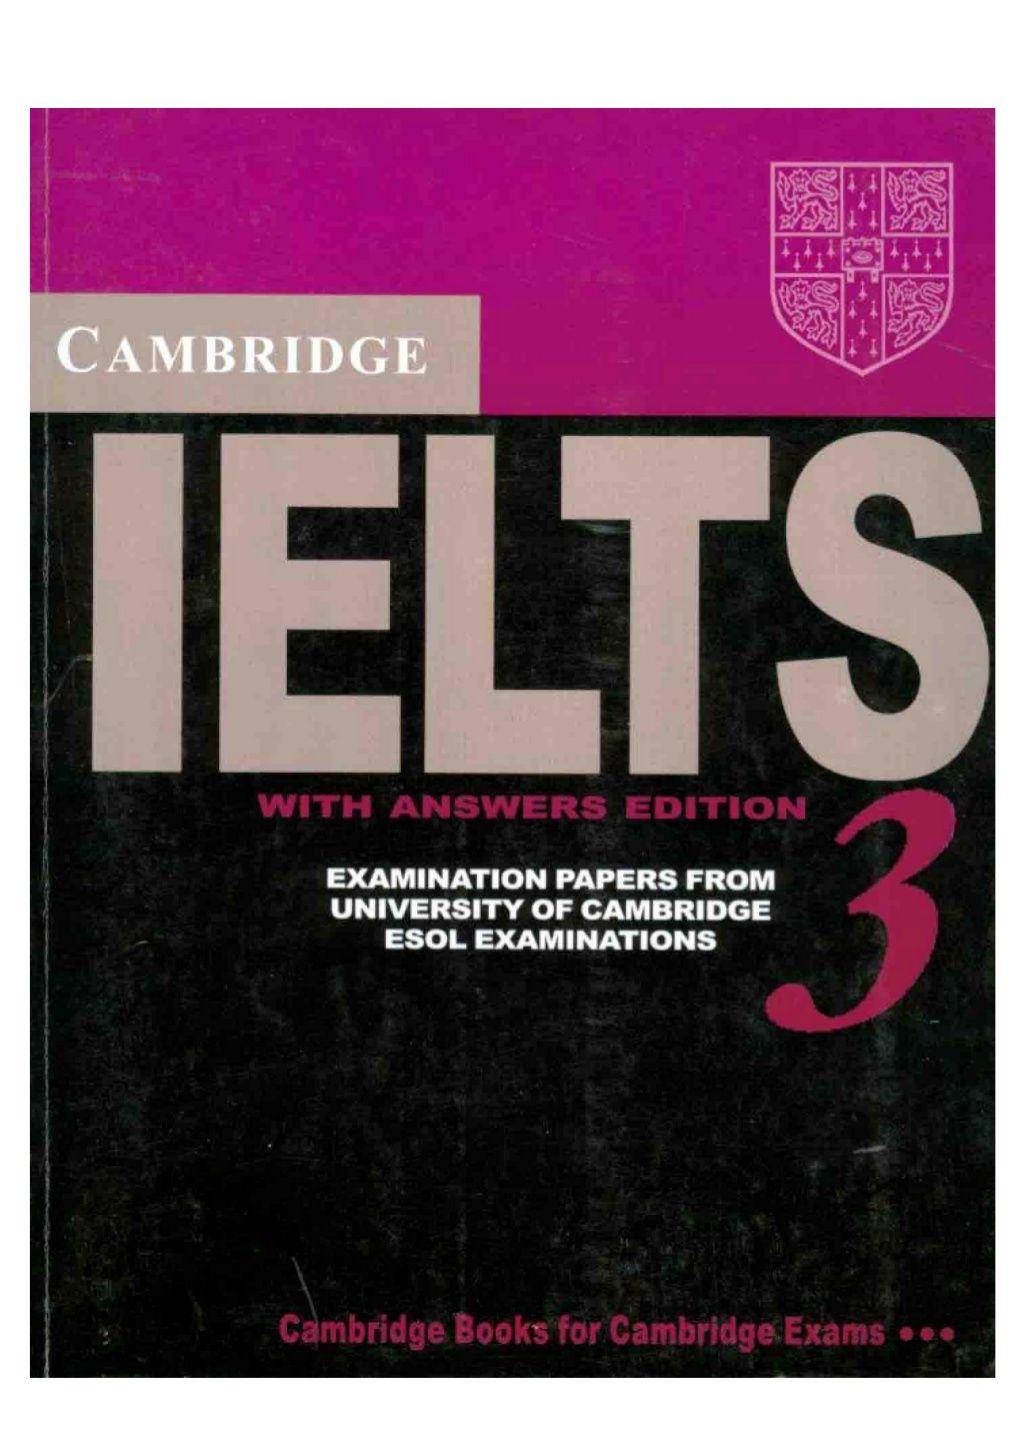 Cambridge Practice Tests for IELTS 3 by Shqiprim CANI via slideshare